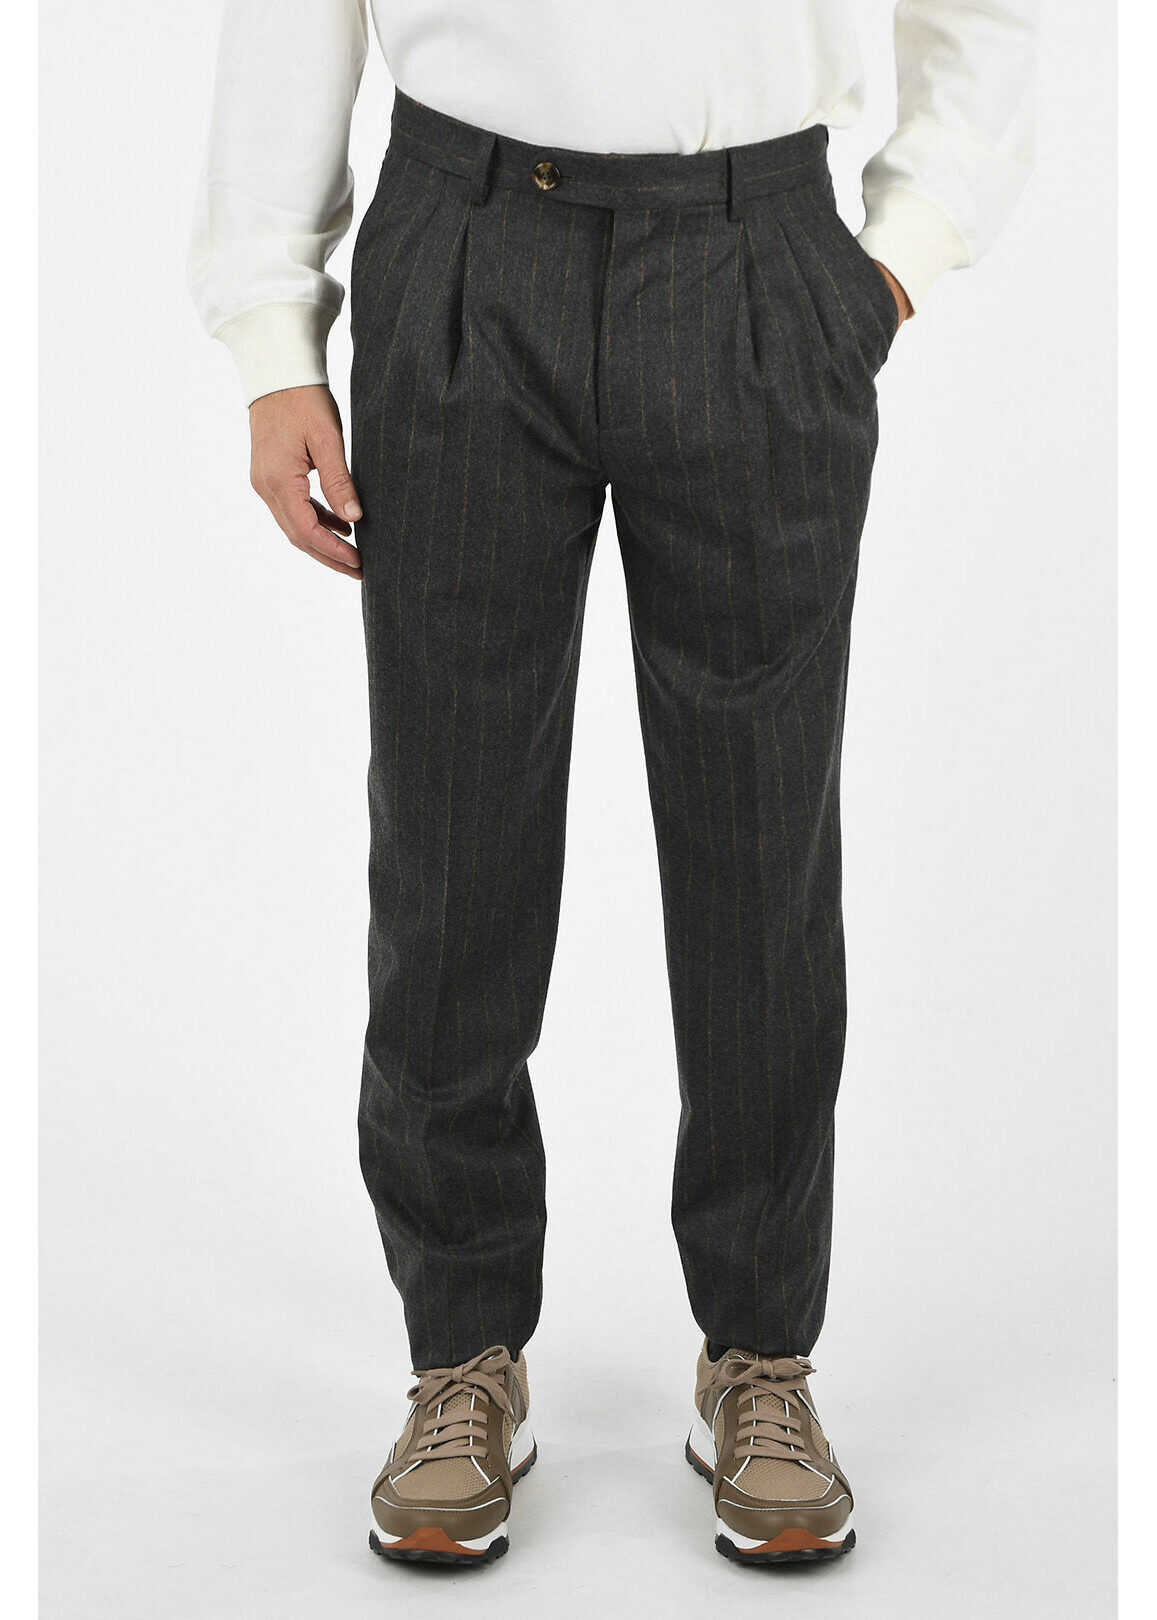 Brunello Cucinelli Wool Pin striped Pant GRAY imagine